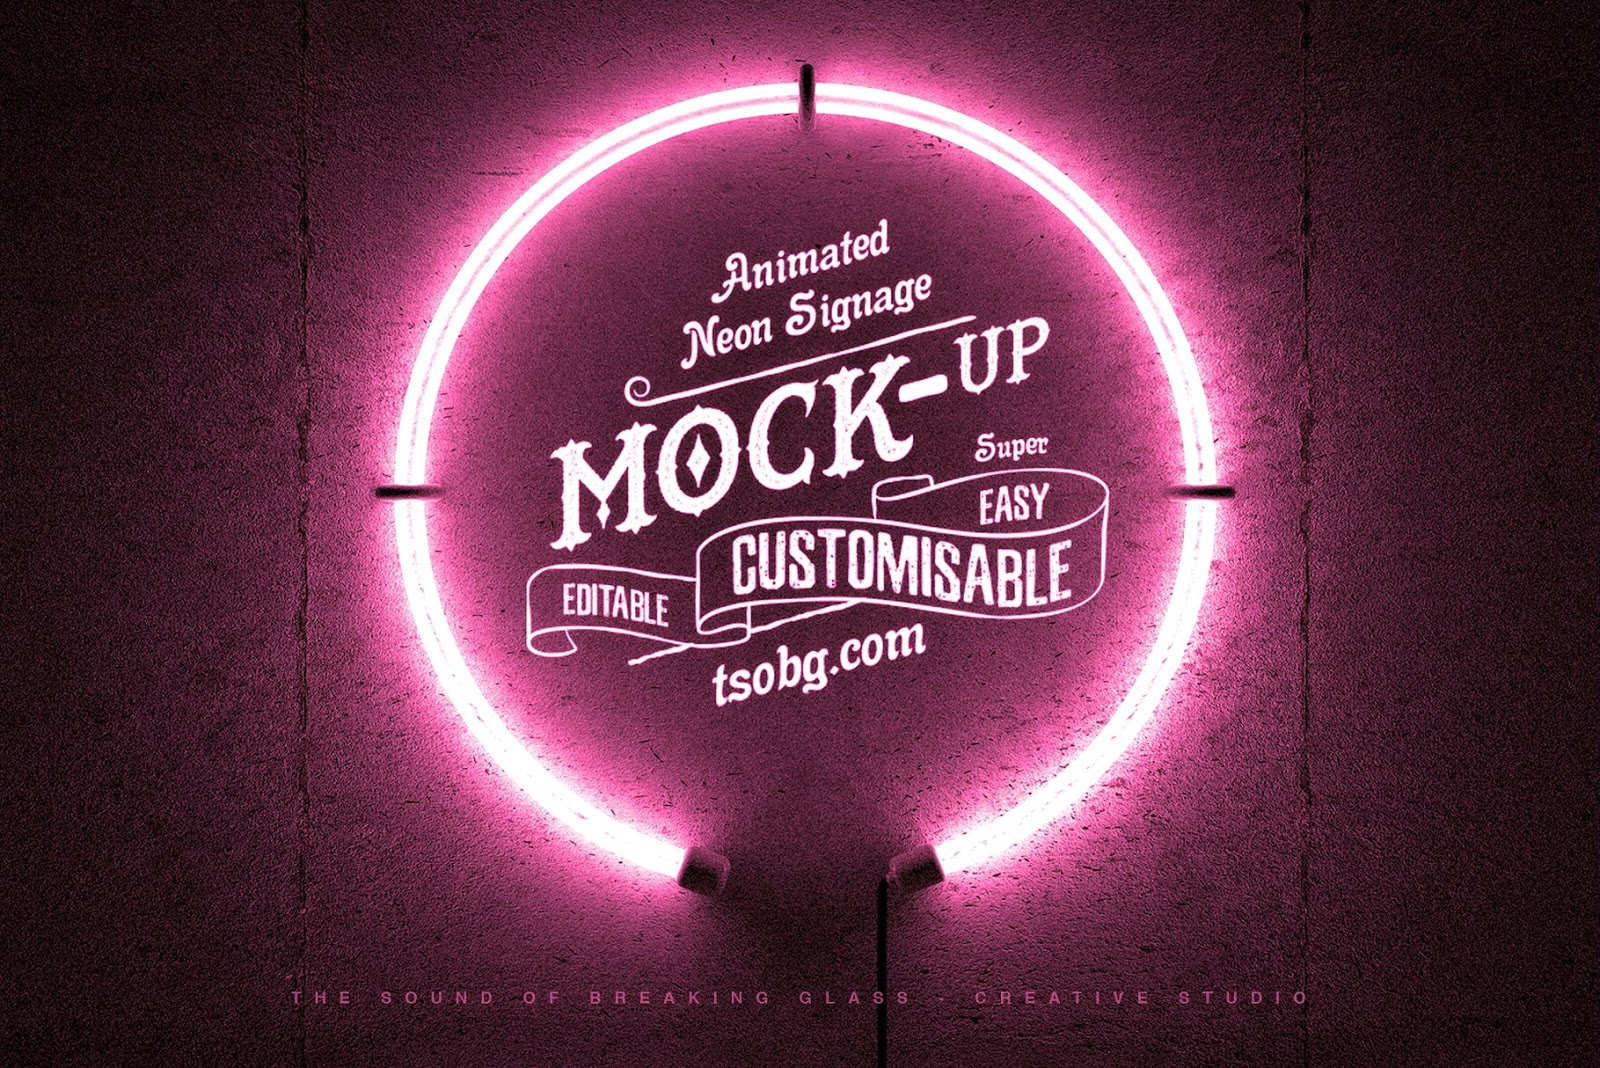 Neon Ring Animated Logo Mockup